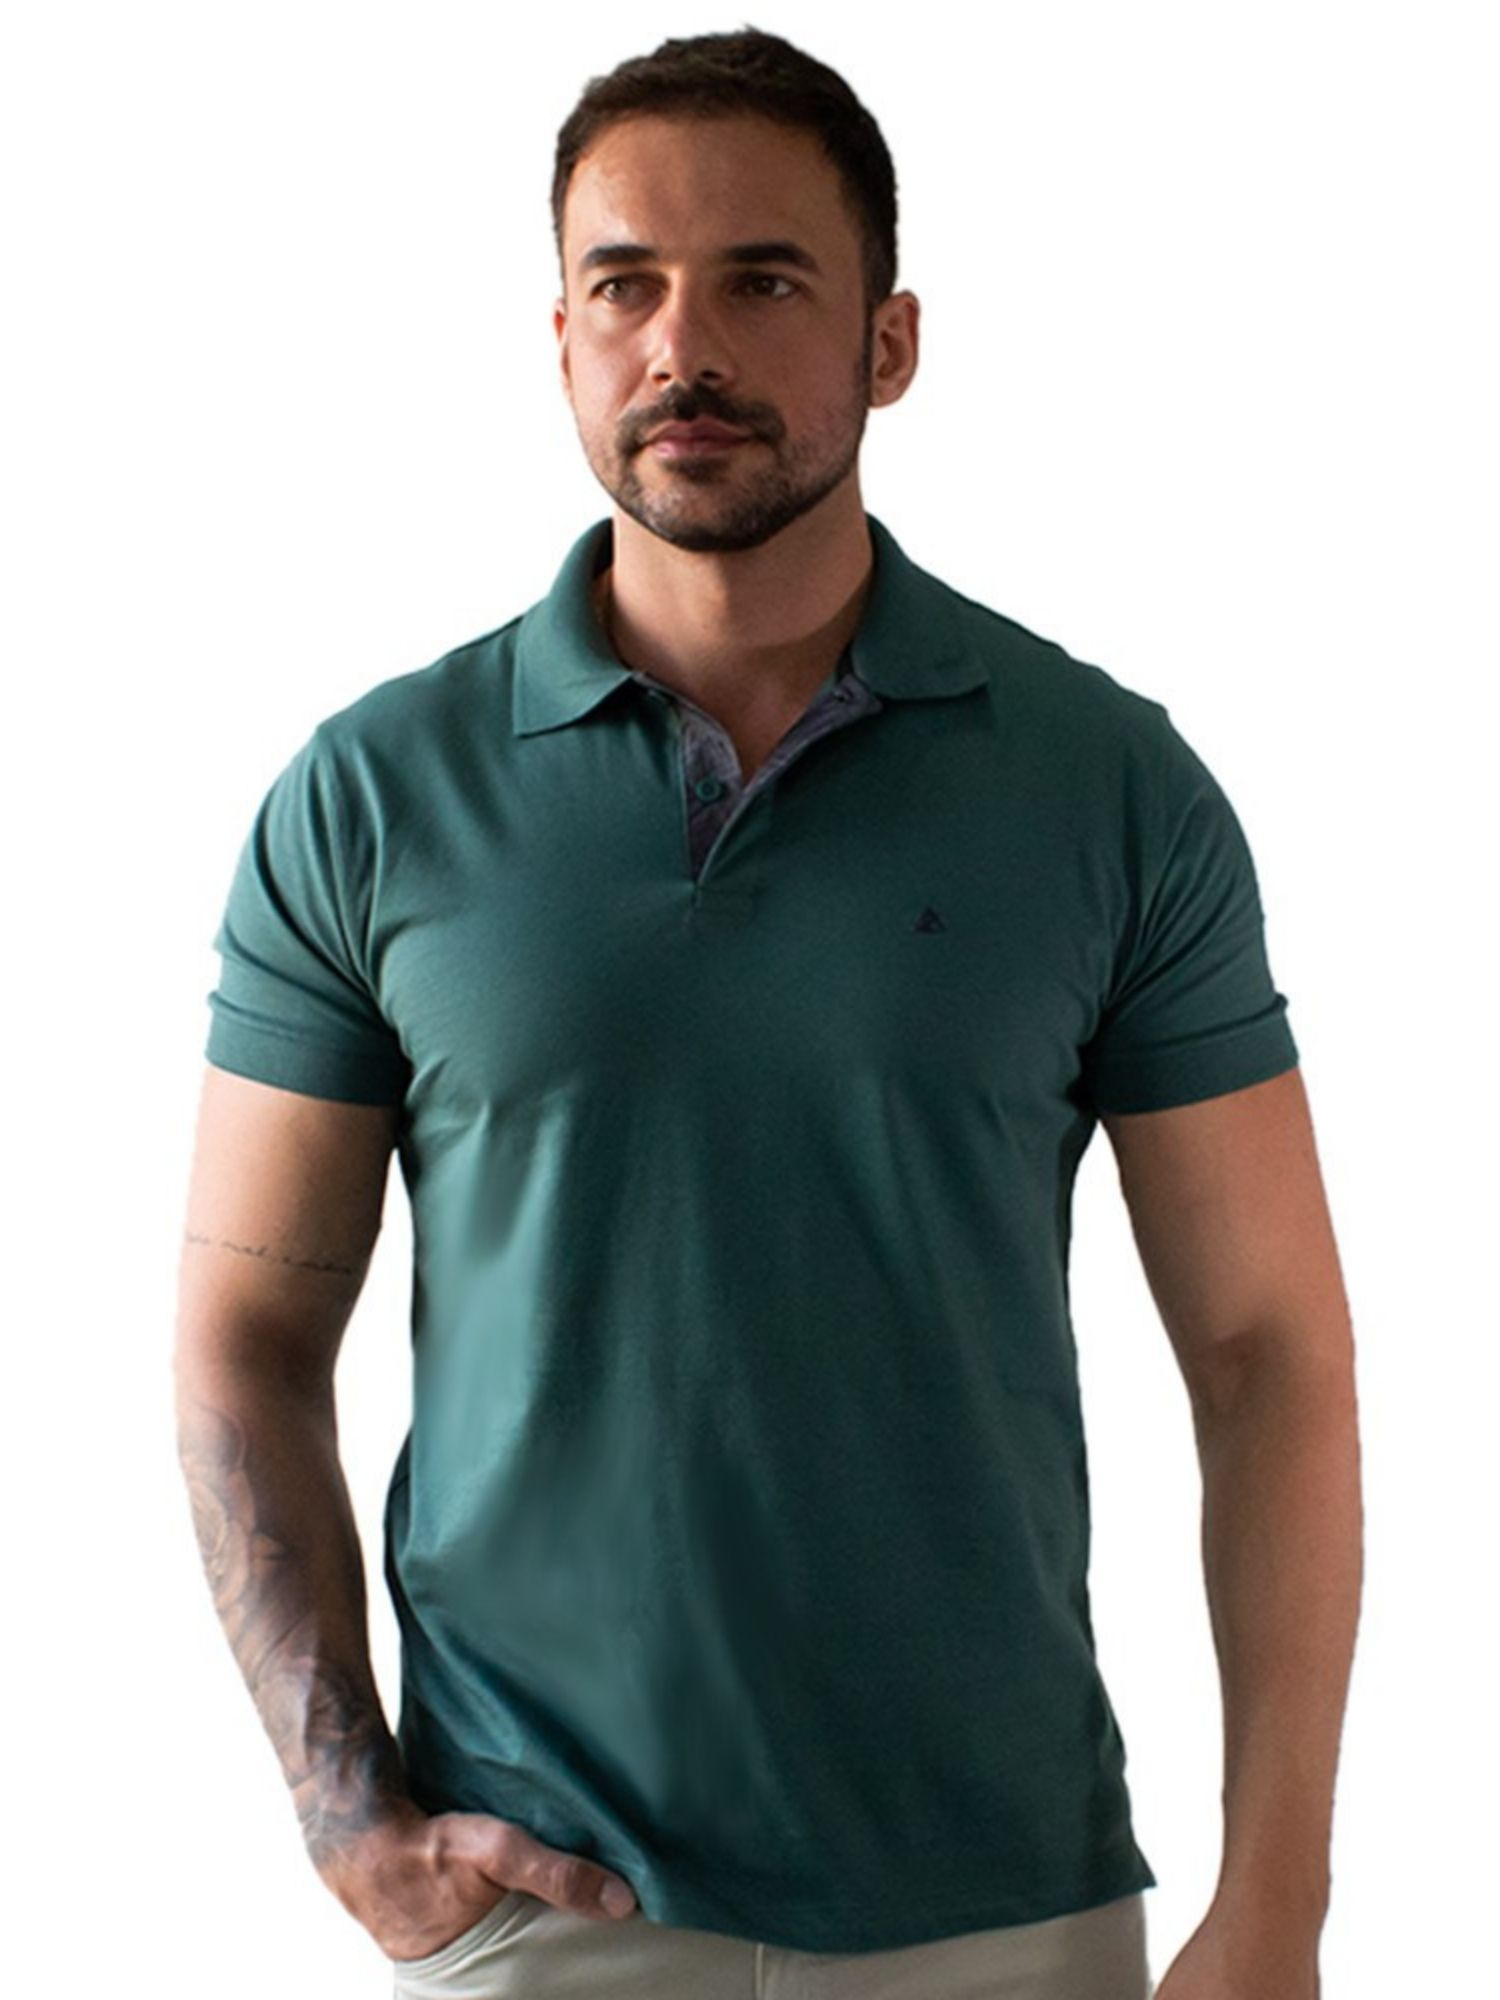 Camiseta Polo Basica Anticorpus 54000